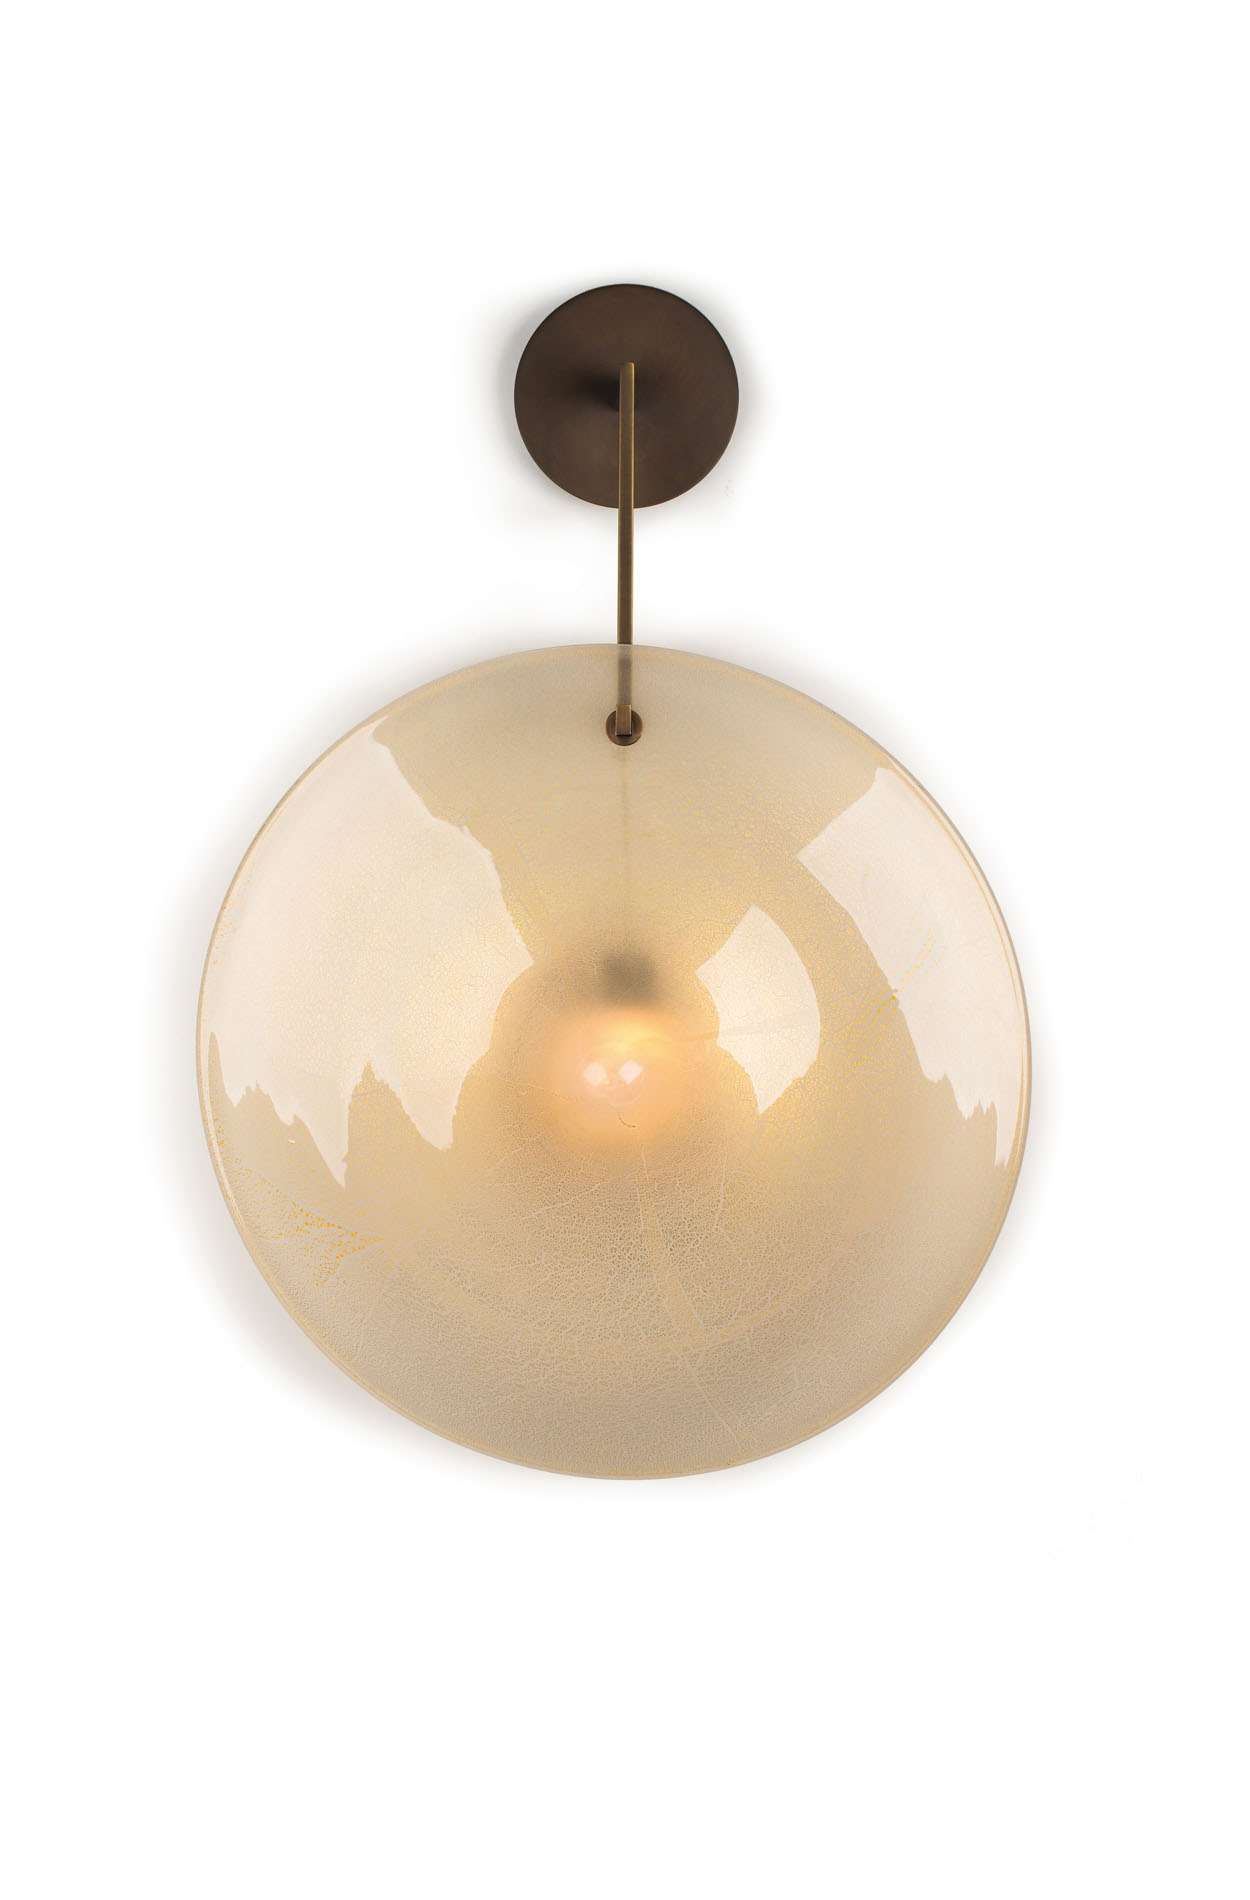 orbe-applique-wall-sconce-silk-gold-bronze-patrick-naggar-veronese.jpg